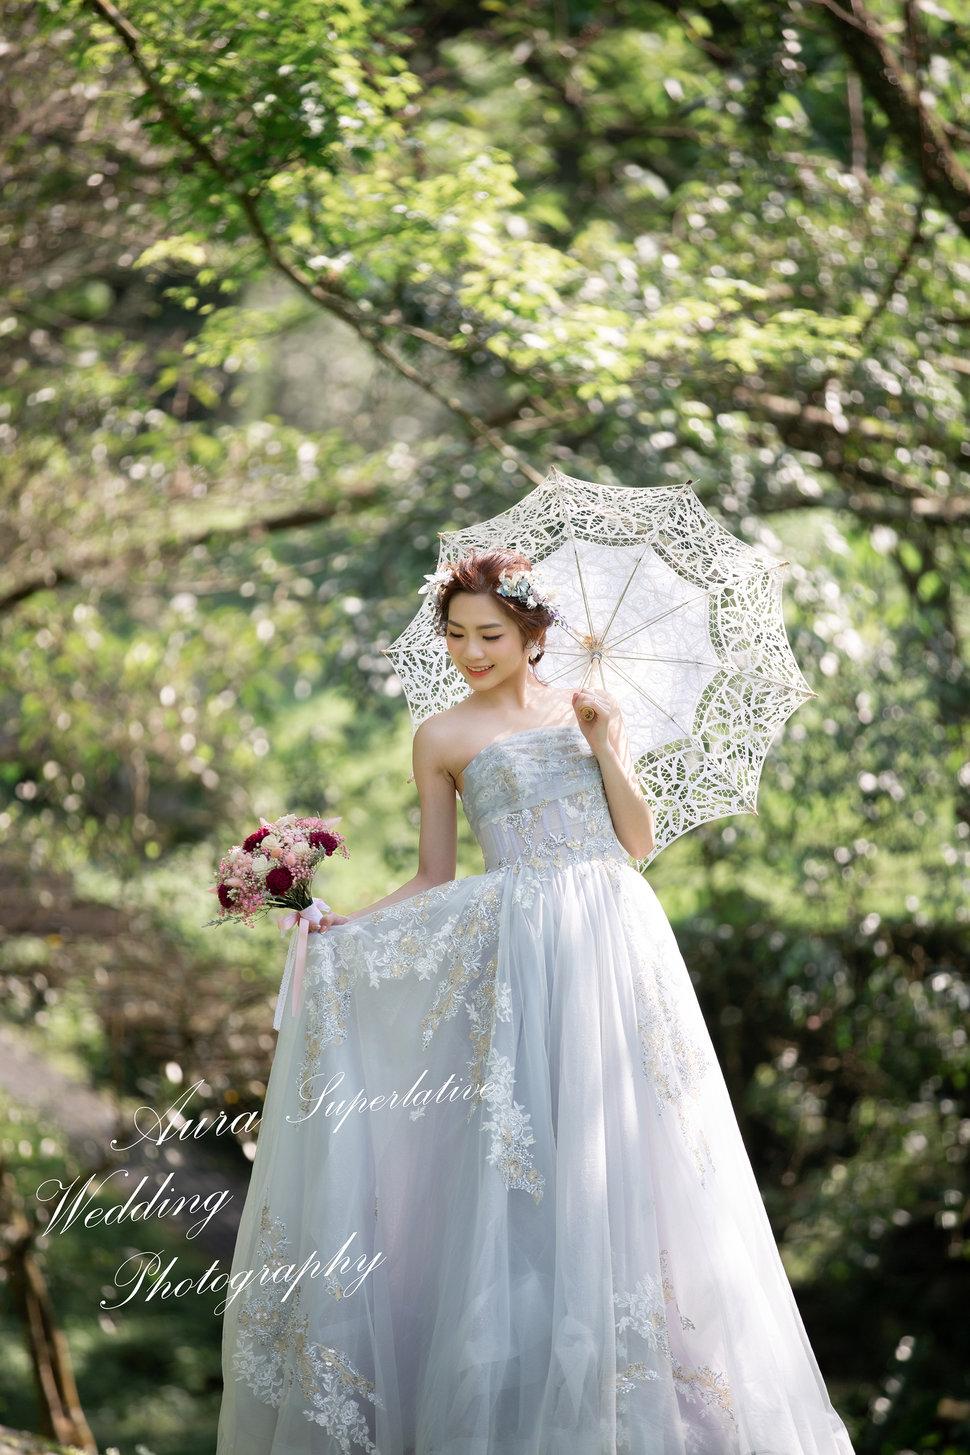 _U_S4022 - 奧拉最上婚紗攝影《結婚吧》